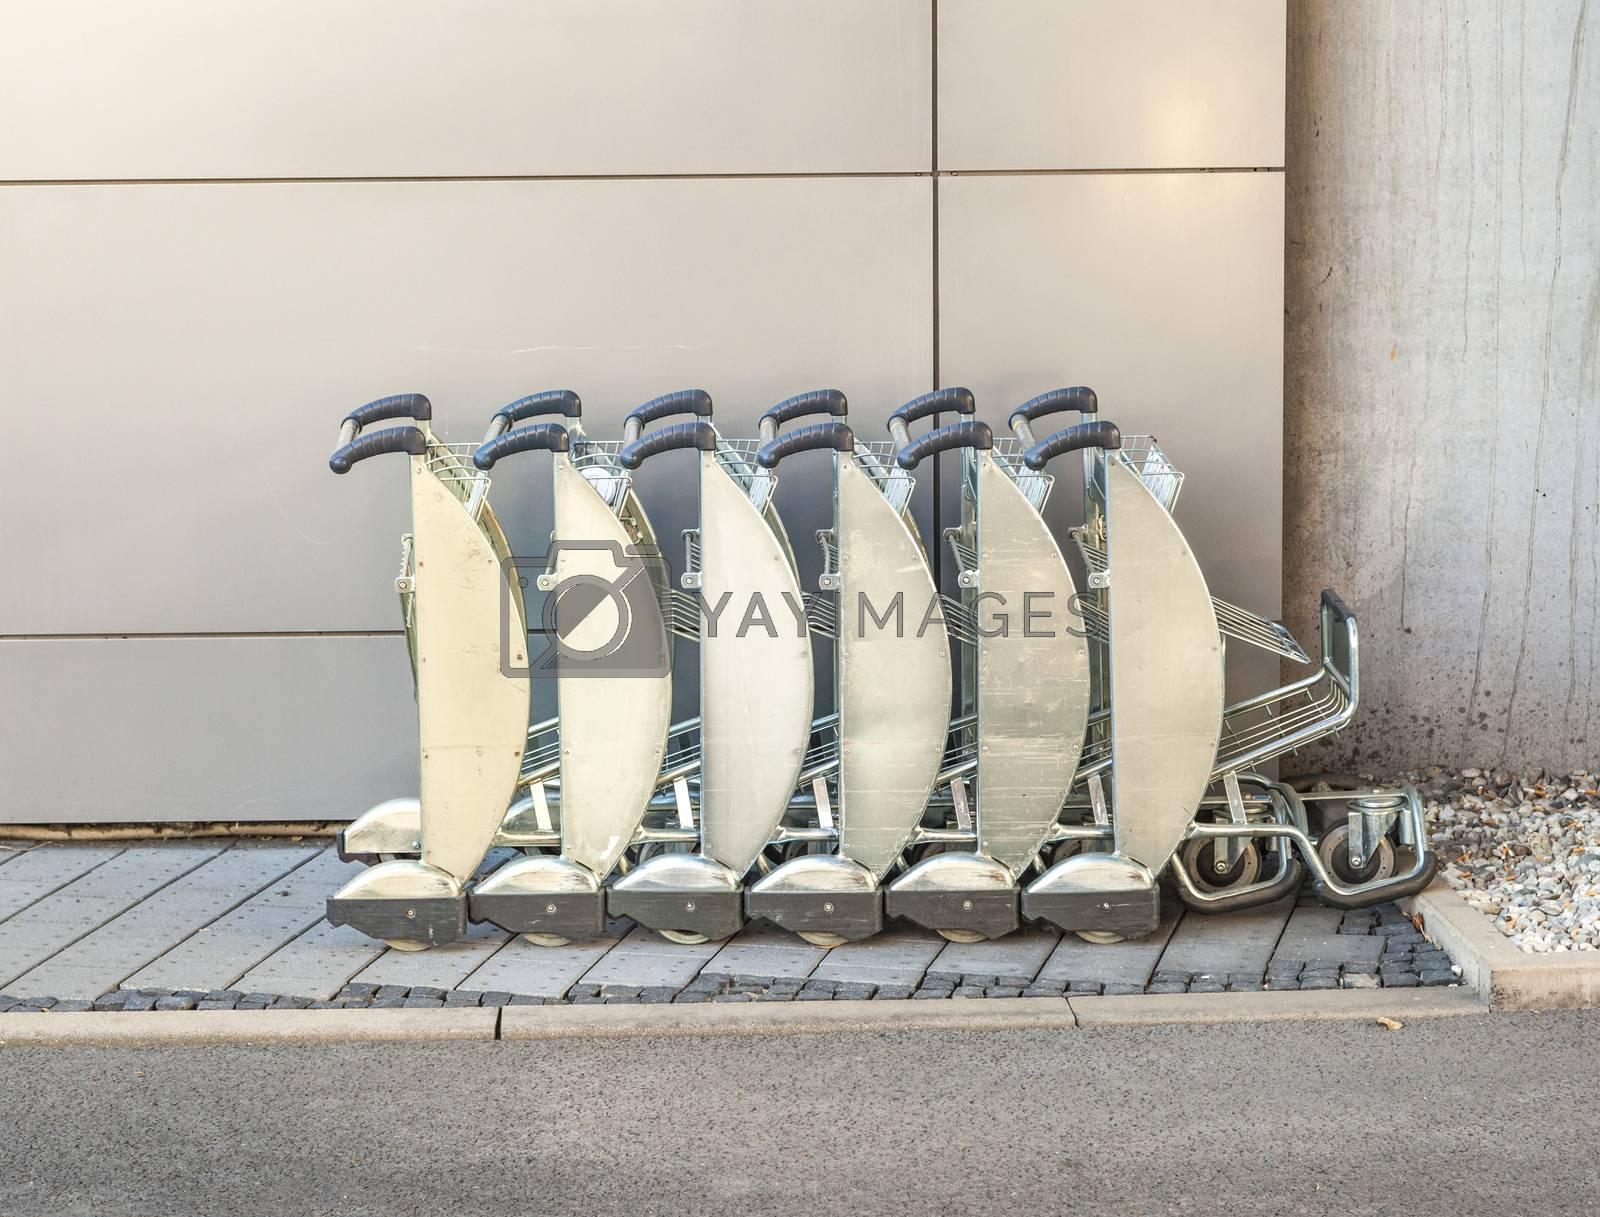 Trolley in airport by meinzahn